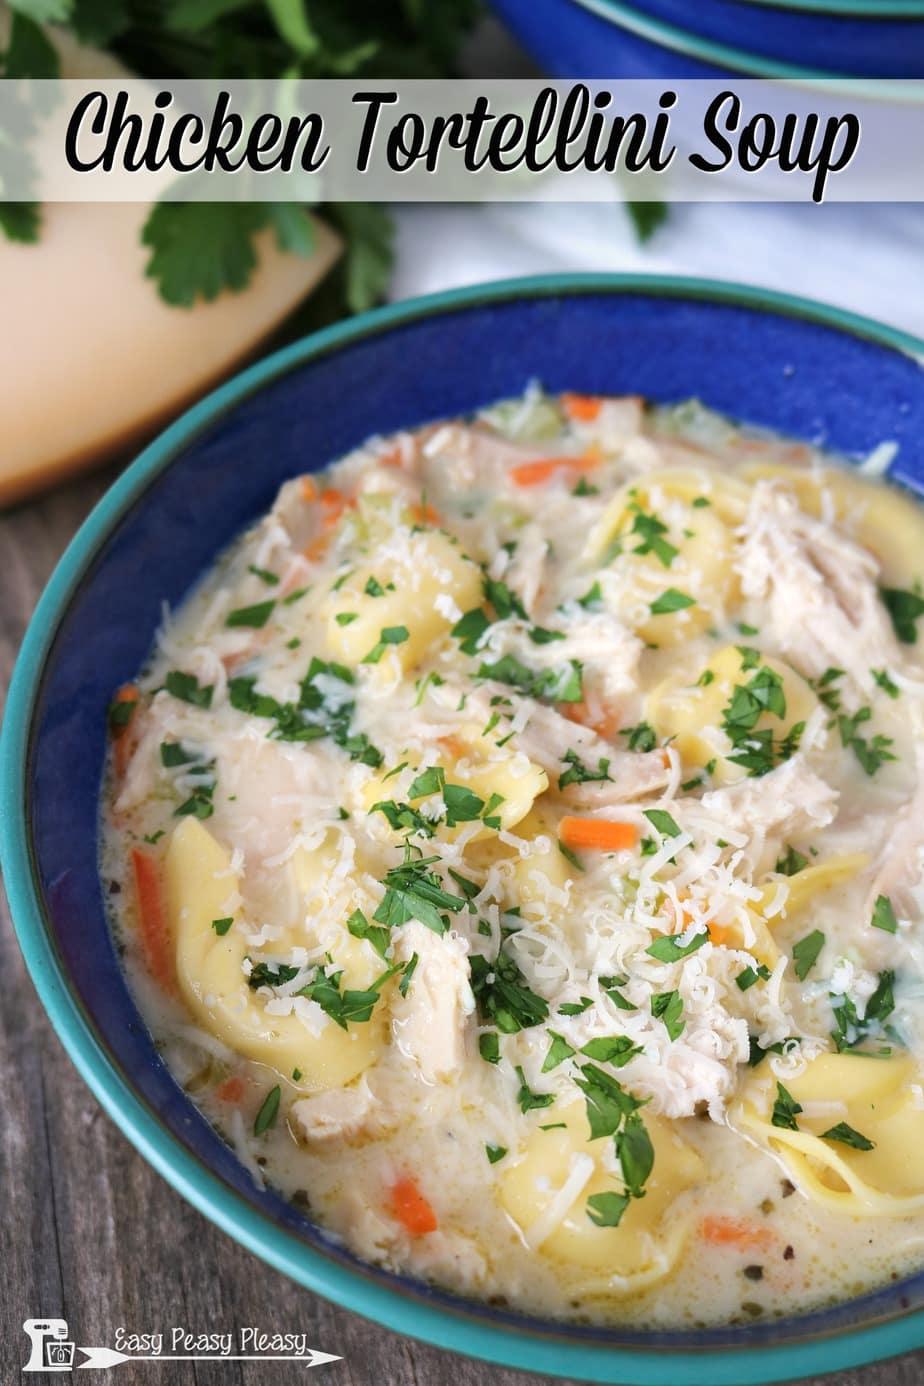 Mouthwatering Chicken Tortellini Soup using a rotisserie chicken.